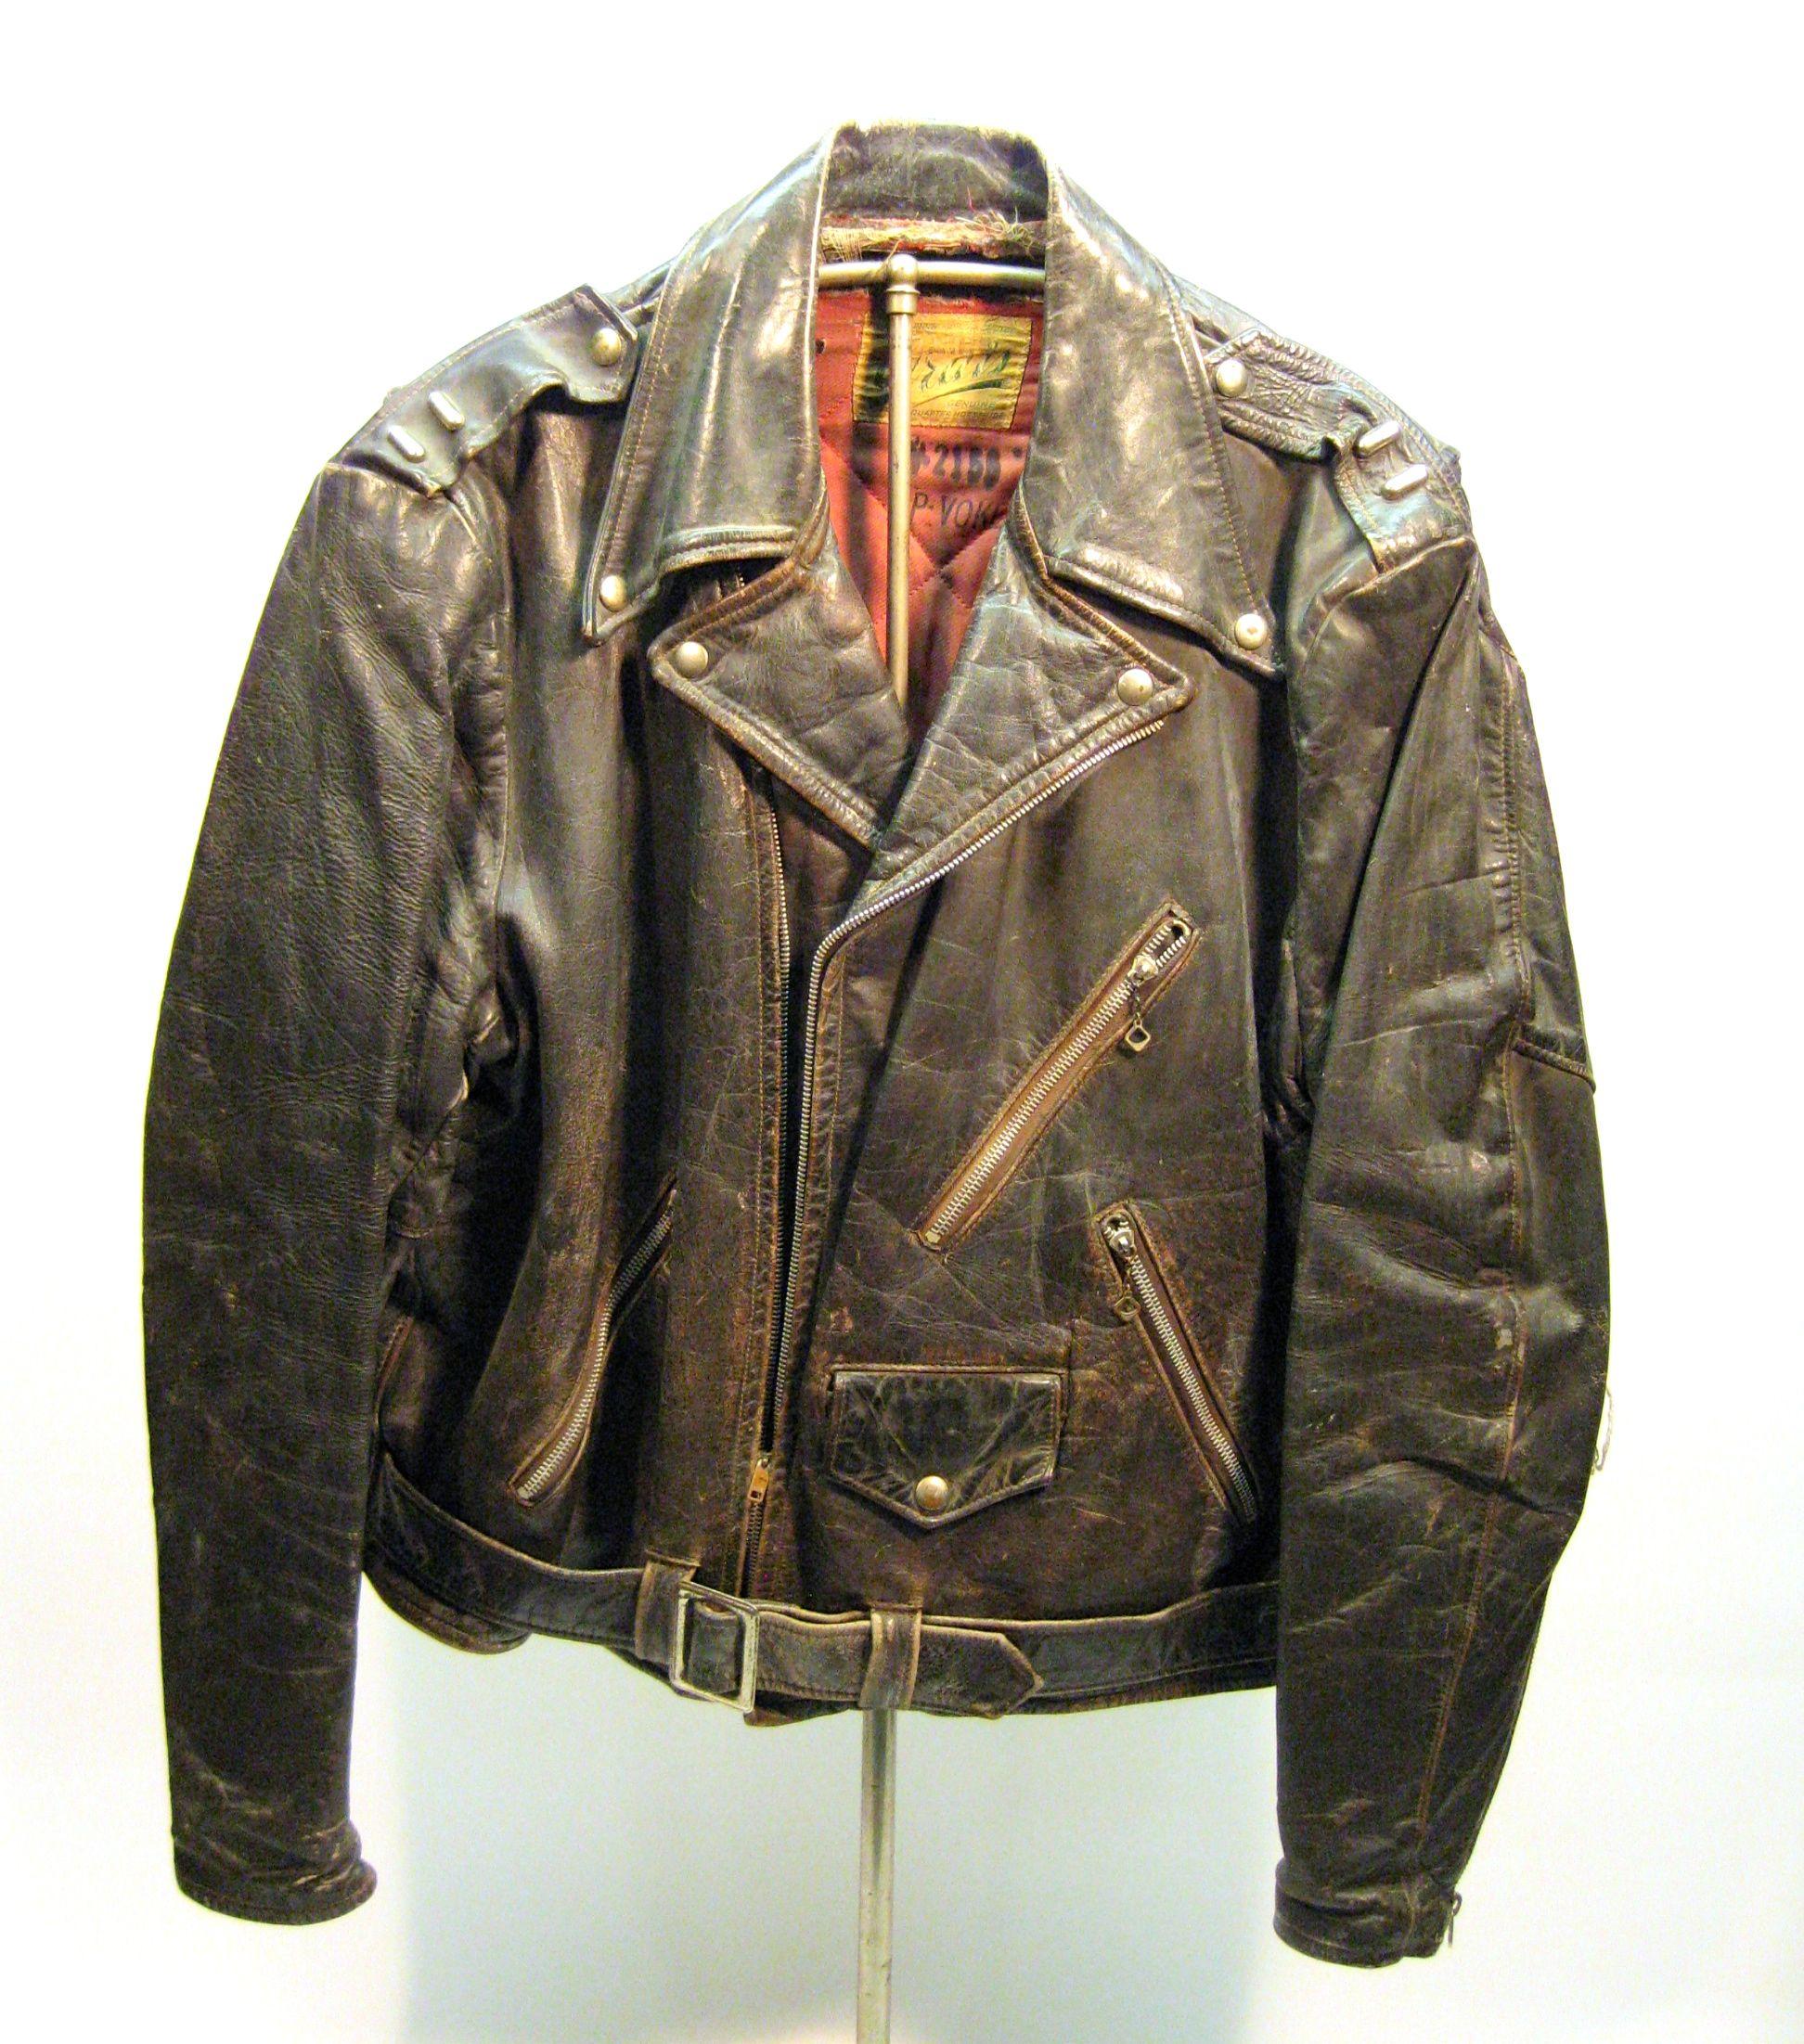 Californian Leather Motorcycle Jacket Vintage Leather Jacket Leather Jacket Vintage Jacket